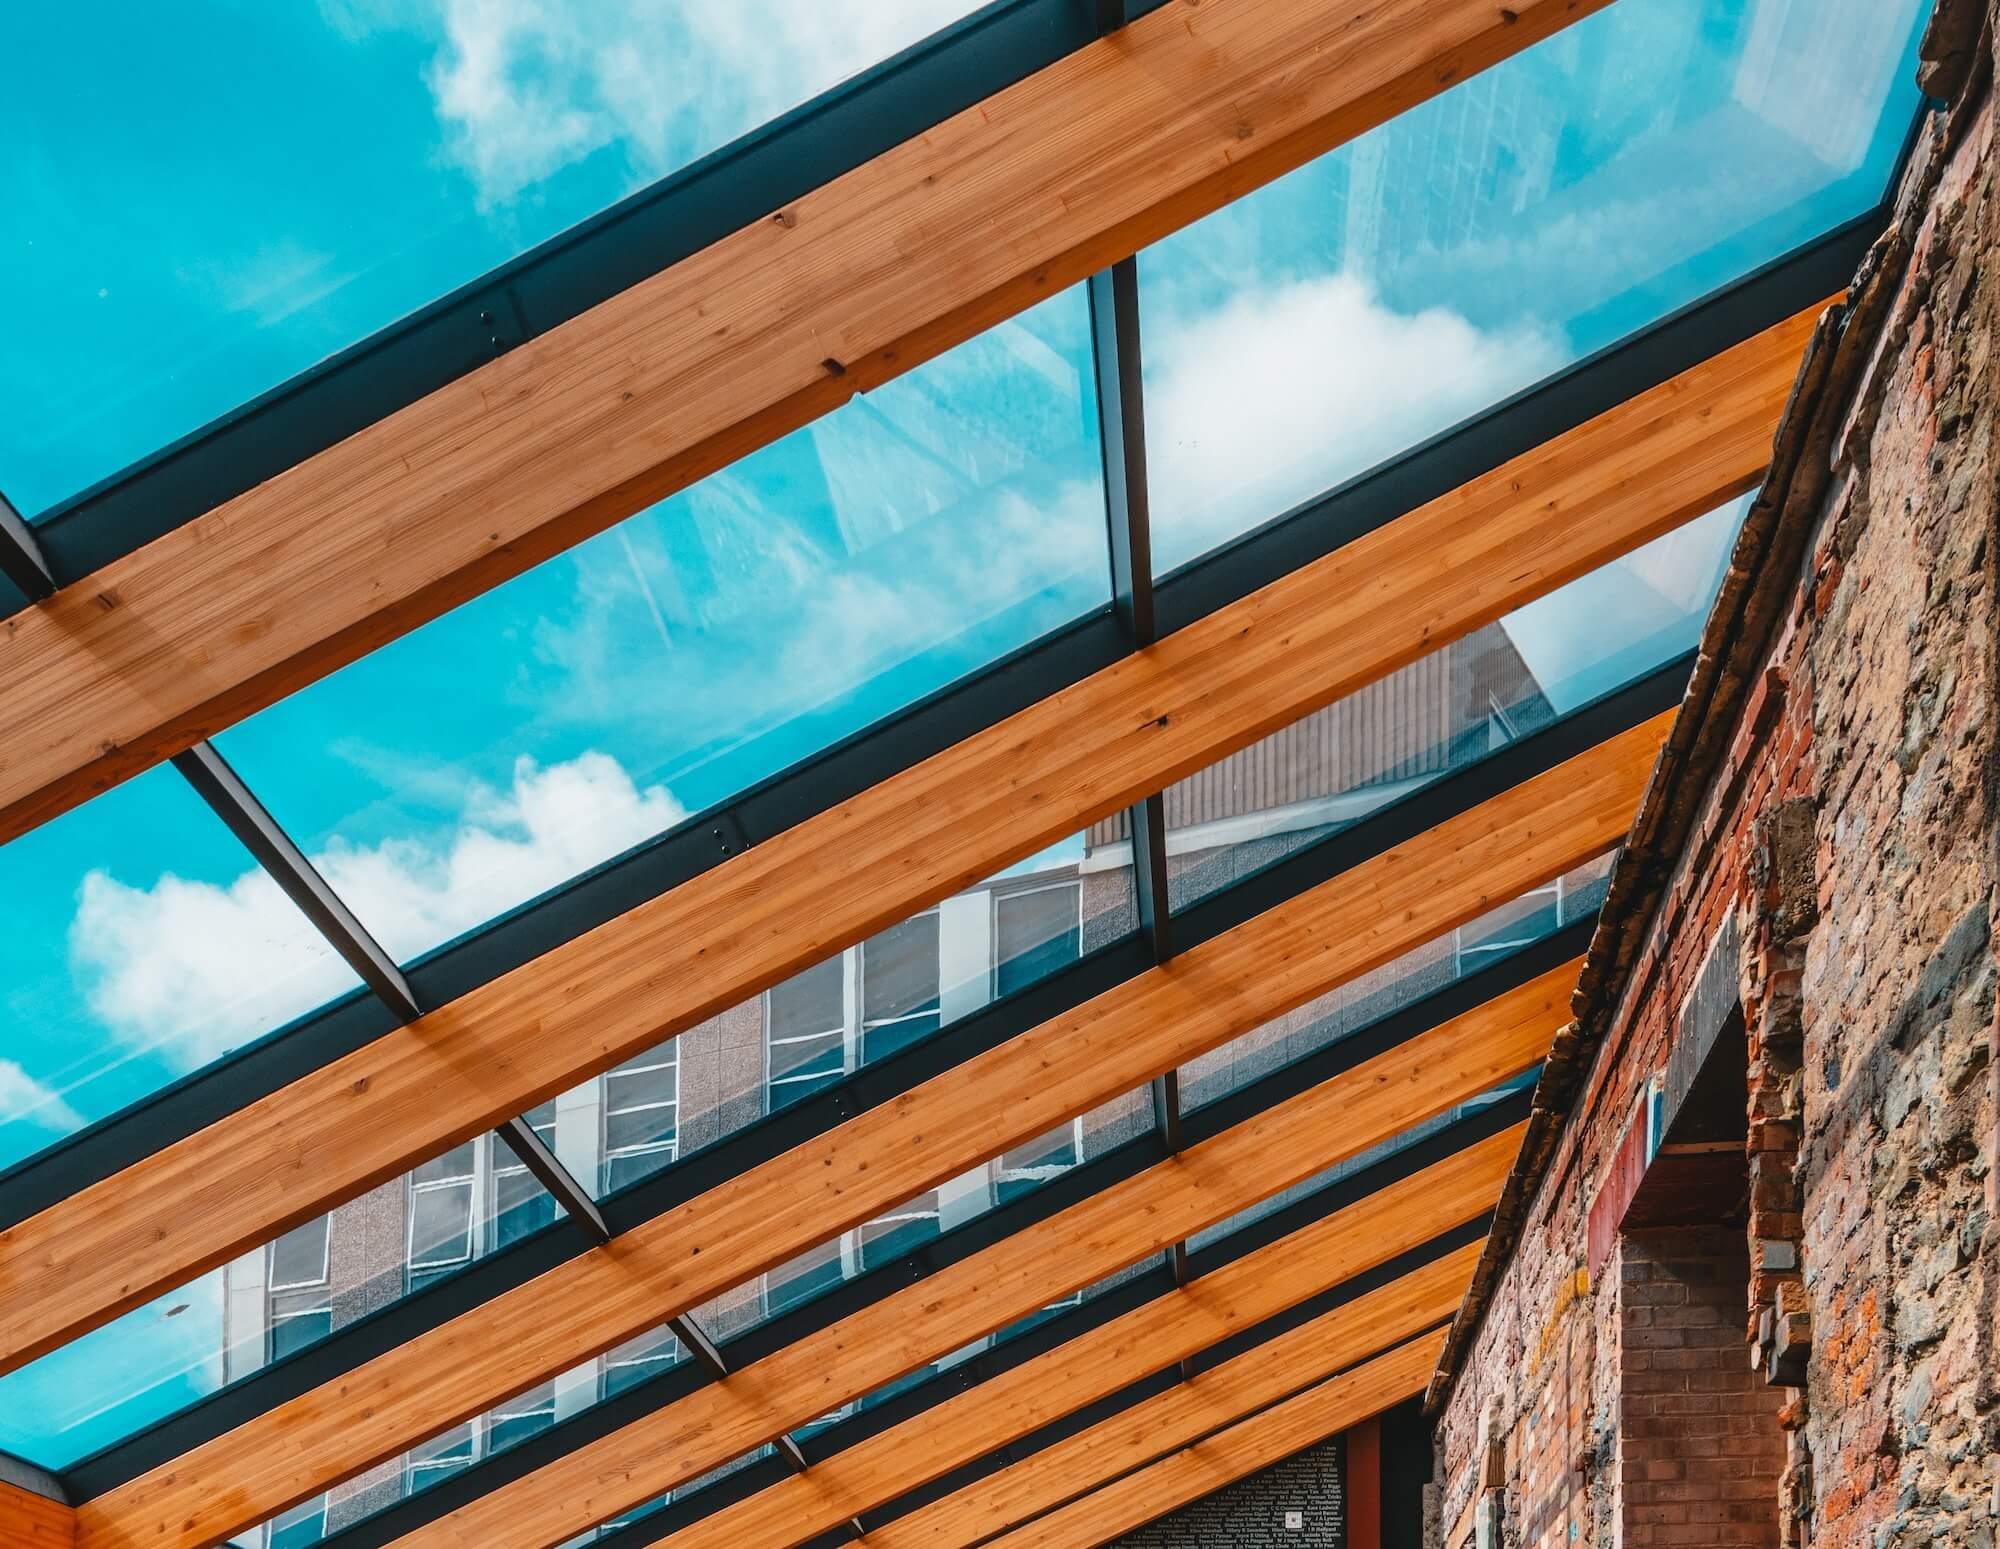 Aluminium glass frame on timber